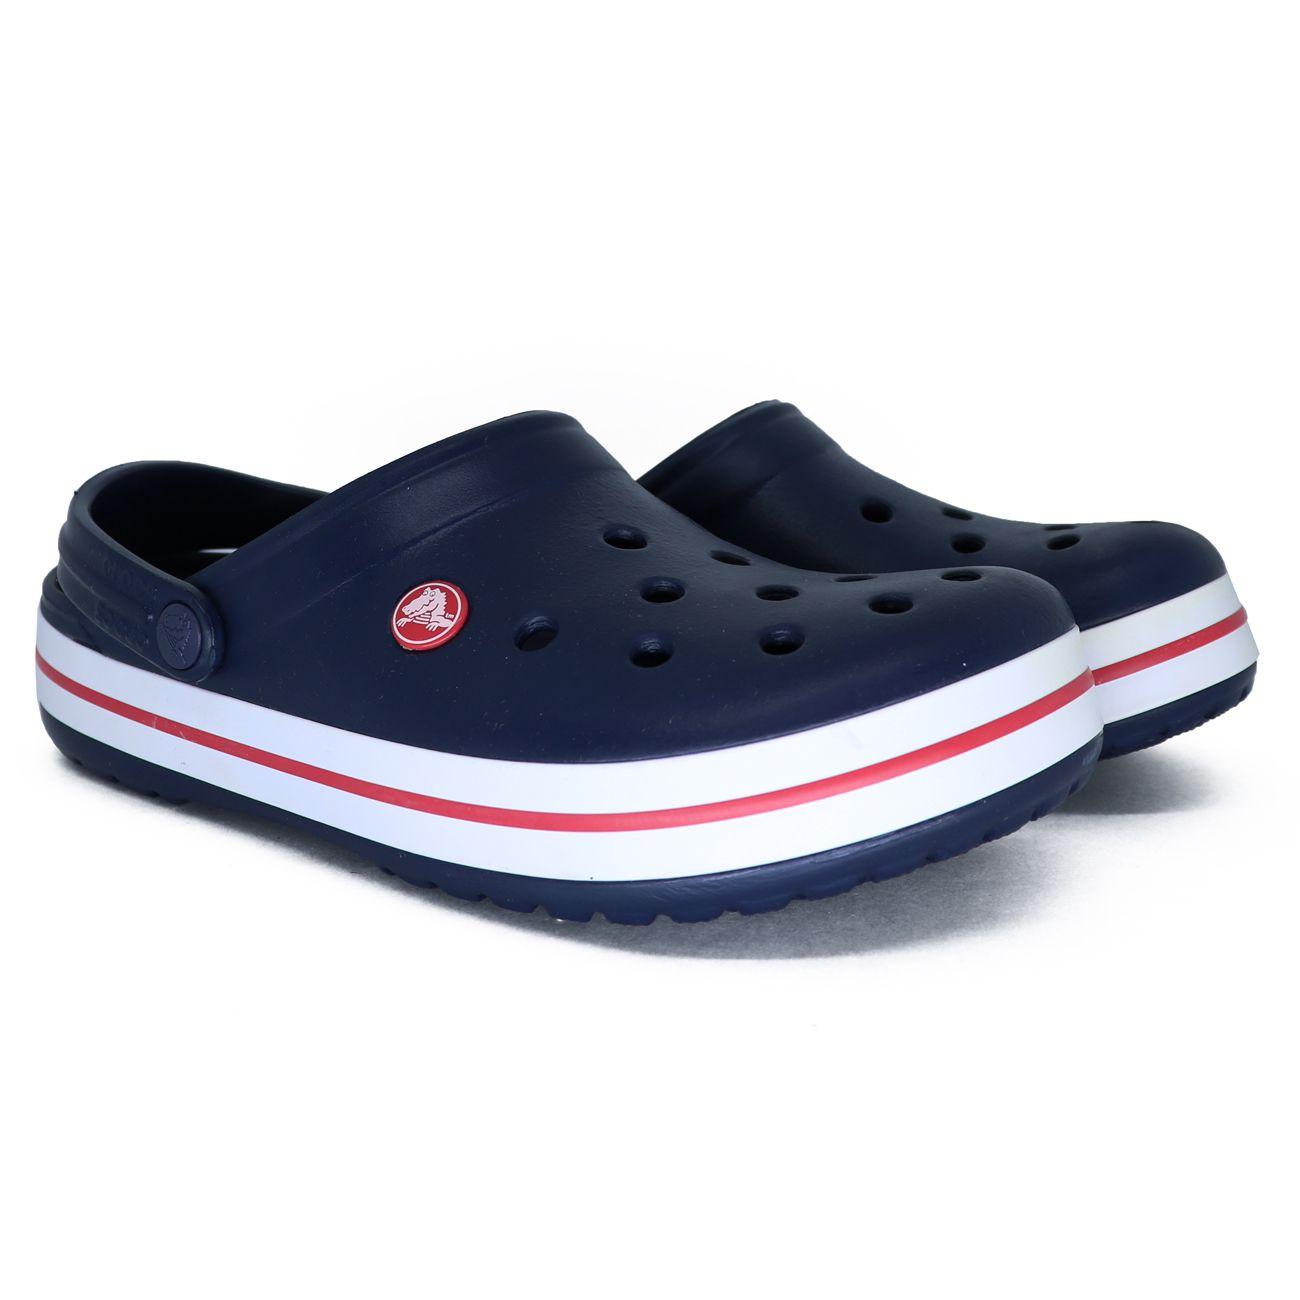 Sandalia Crocs Crocband Infantil Azul